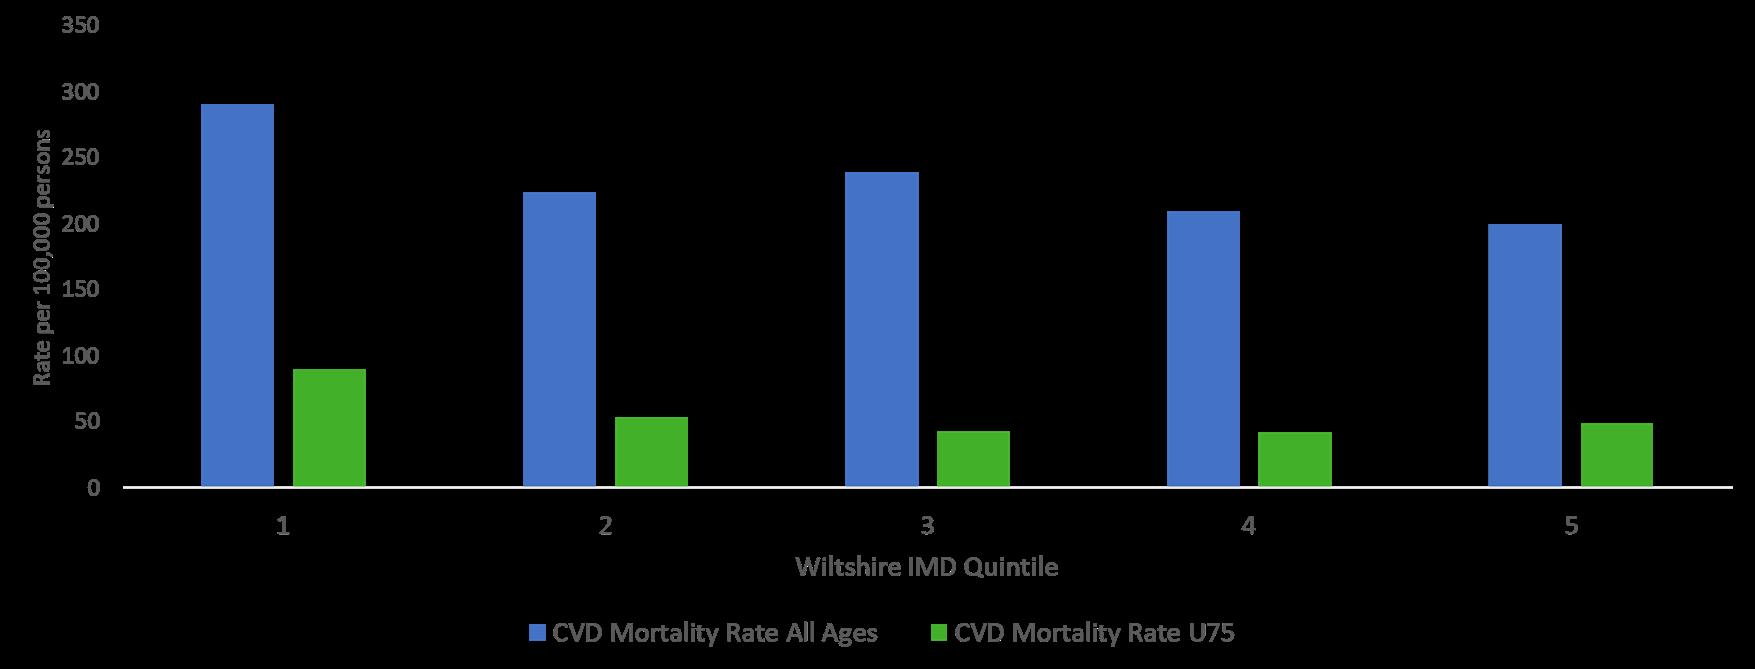 CVD mortality inequalities